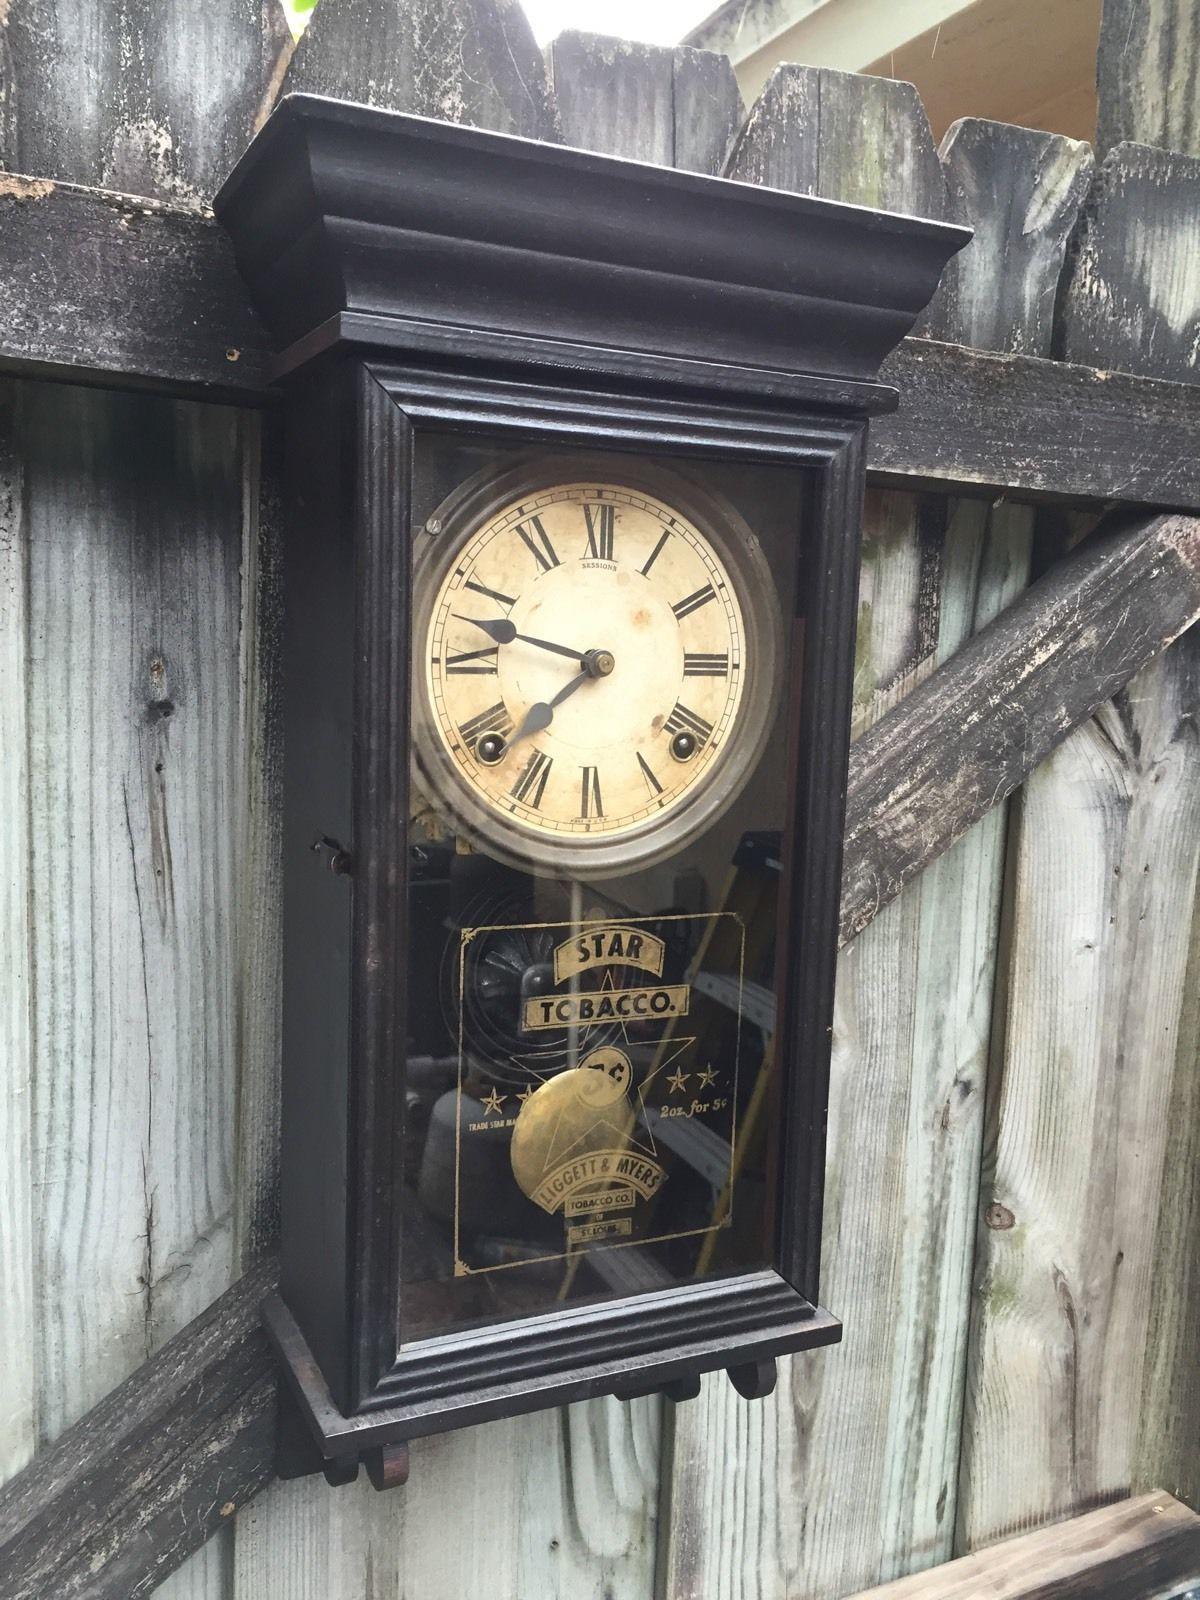 Star Tobacco Antique Miniature Regulator Wall Clock By Sessions Clock Antiques Wall Clock